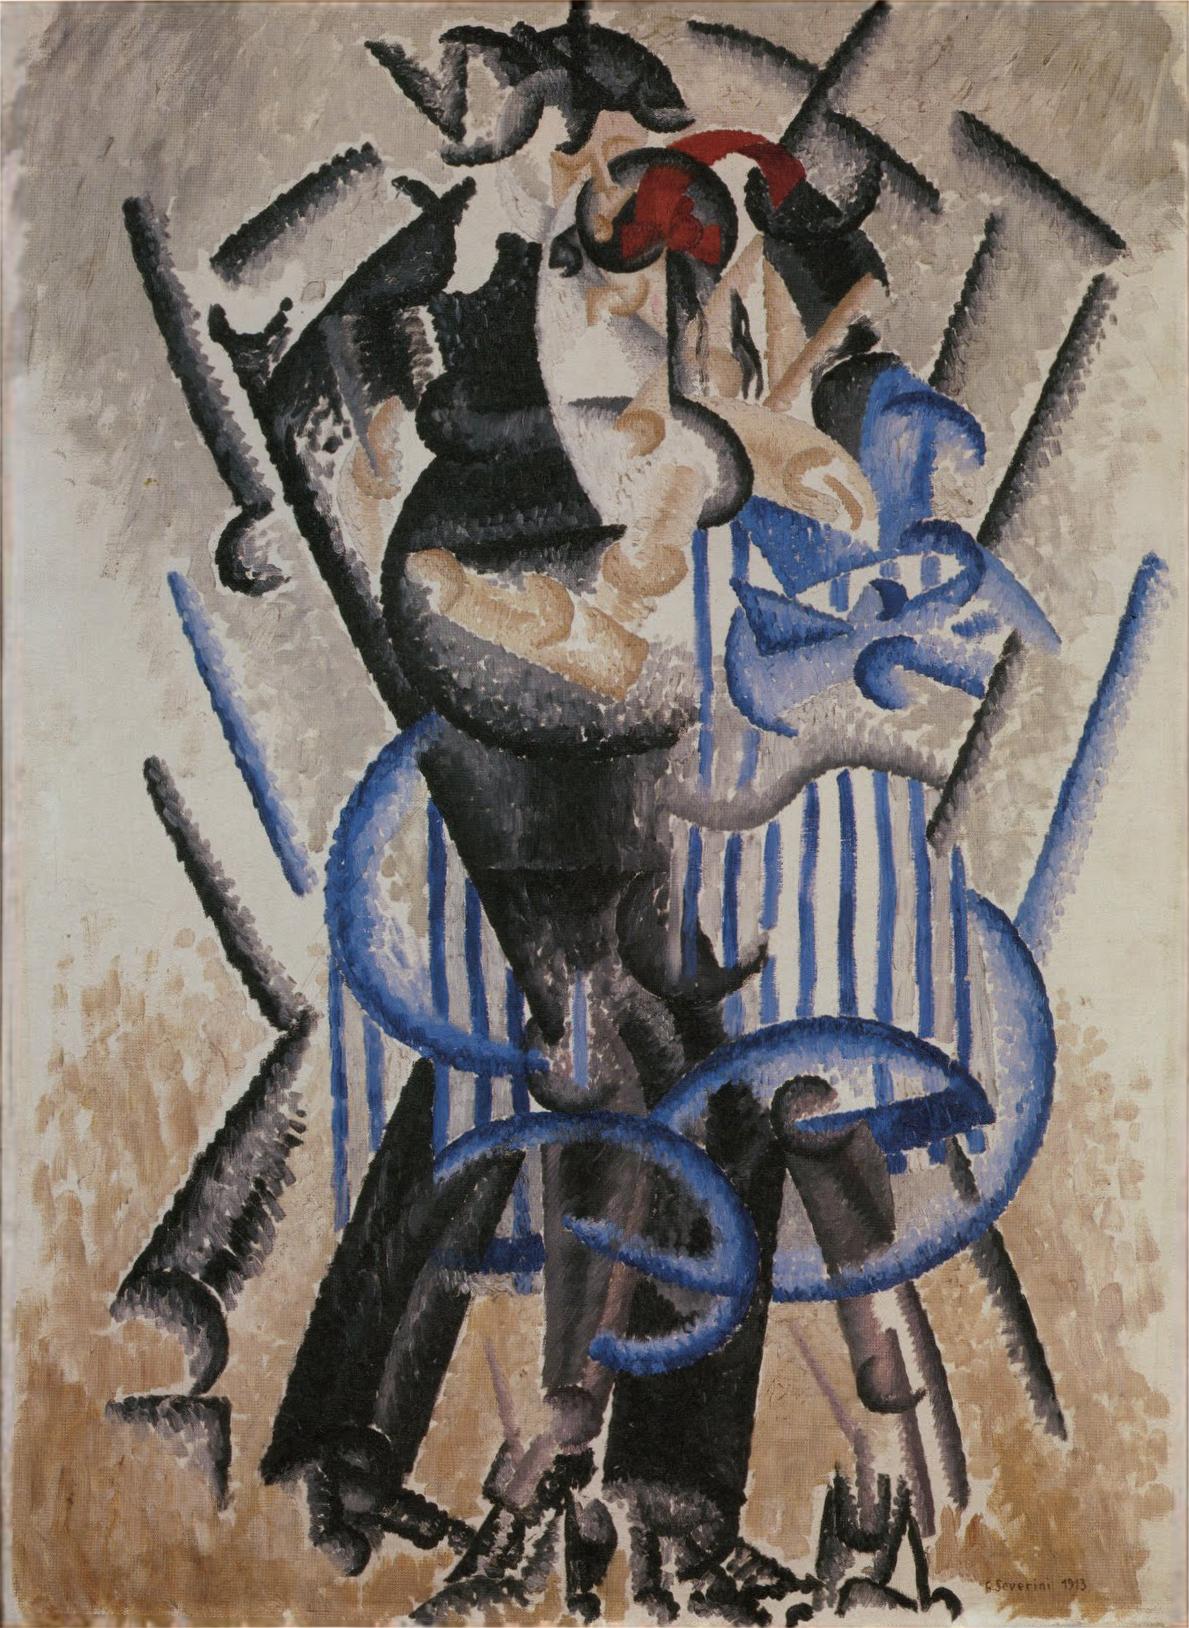 La Danse De L Ours : danse, File:Gino, Severini,, 1913,, Danse, L'ours, Moulin, Rouge,, Canvas,, Musée, National, D'Art, Moderne.jpg, Wikipedia